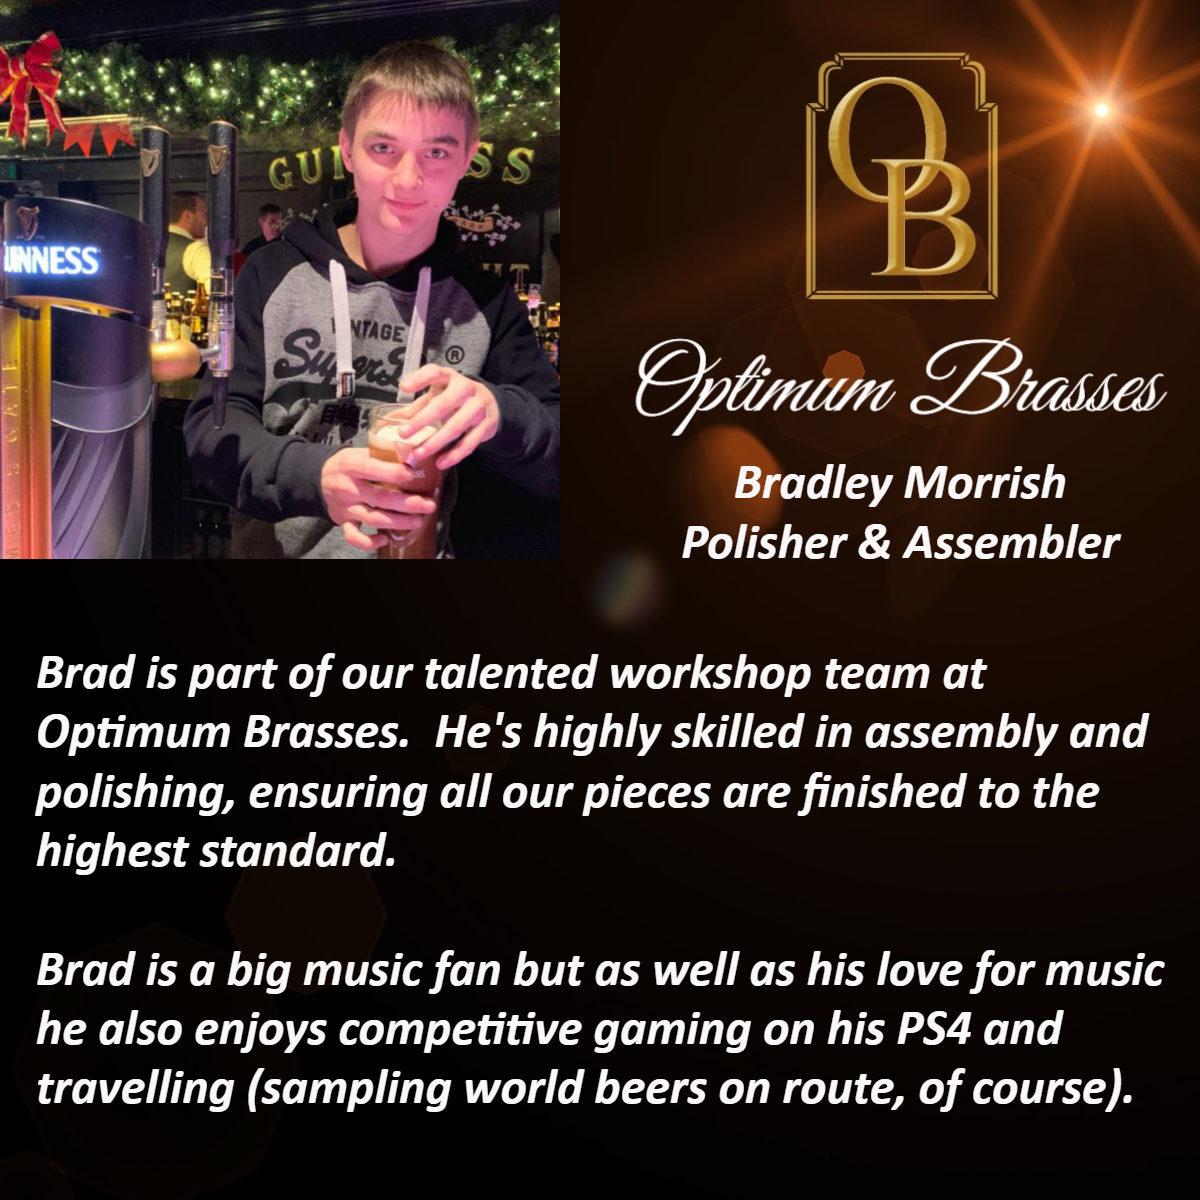 Bradley Morrish - Polisher and Assembler